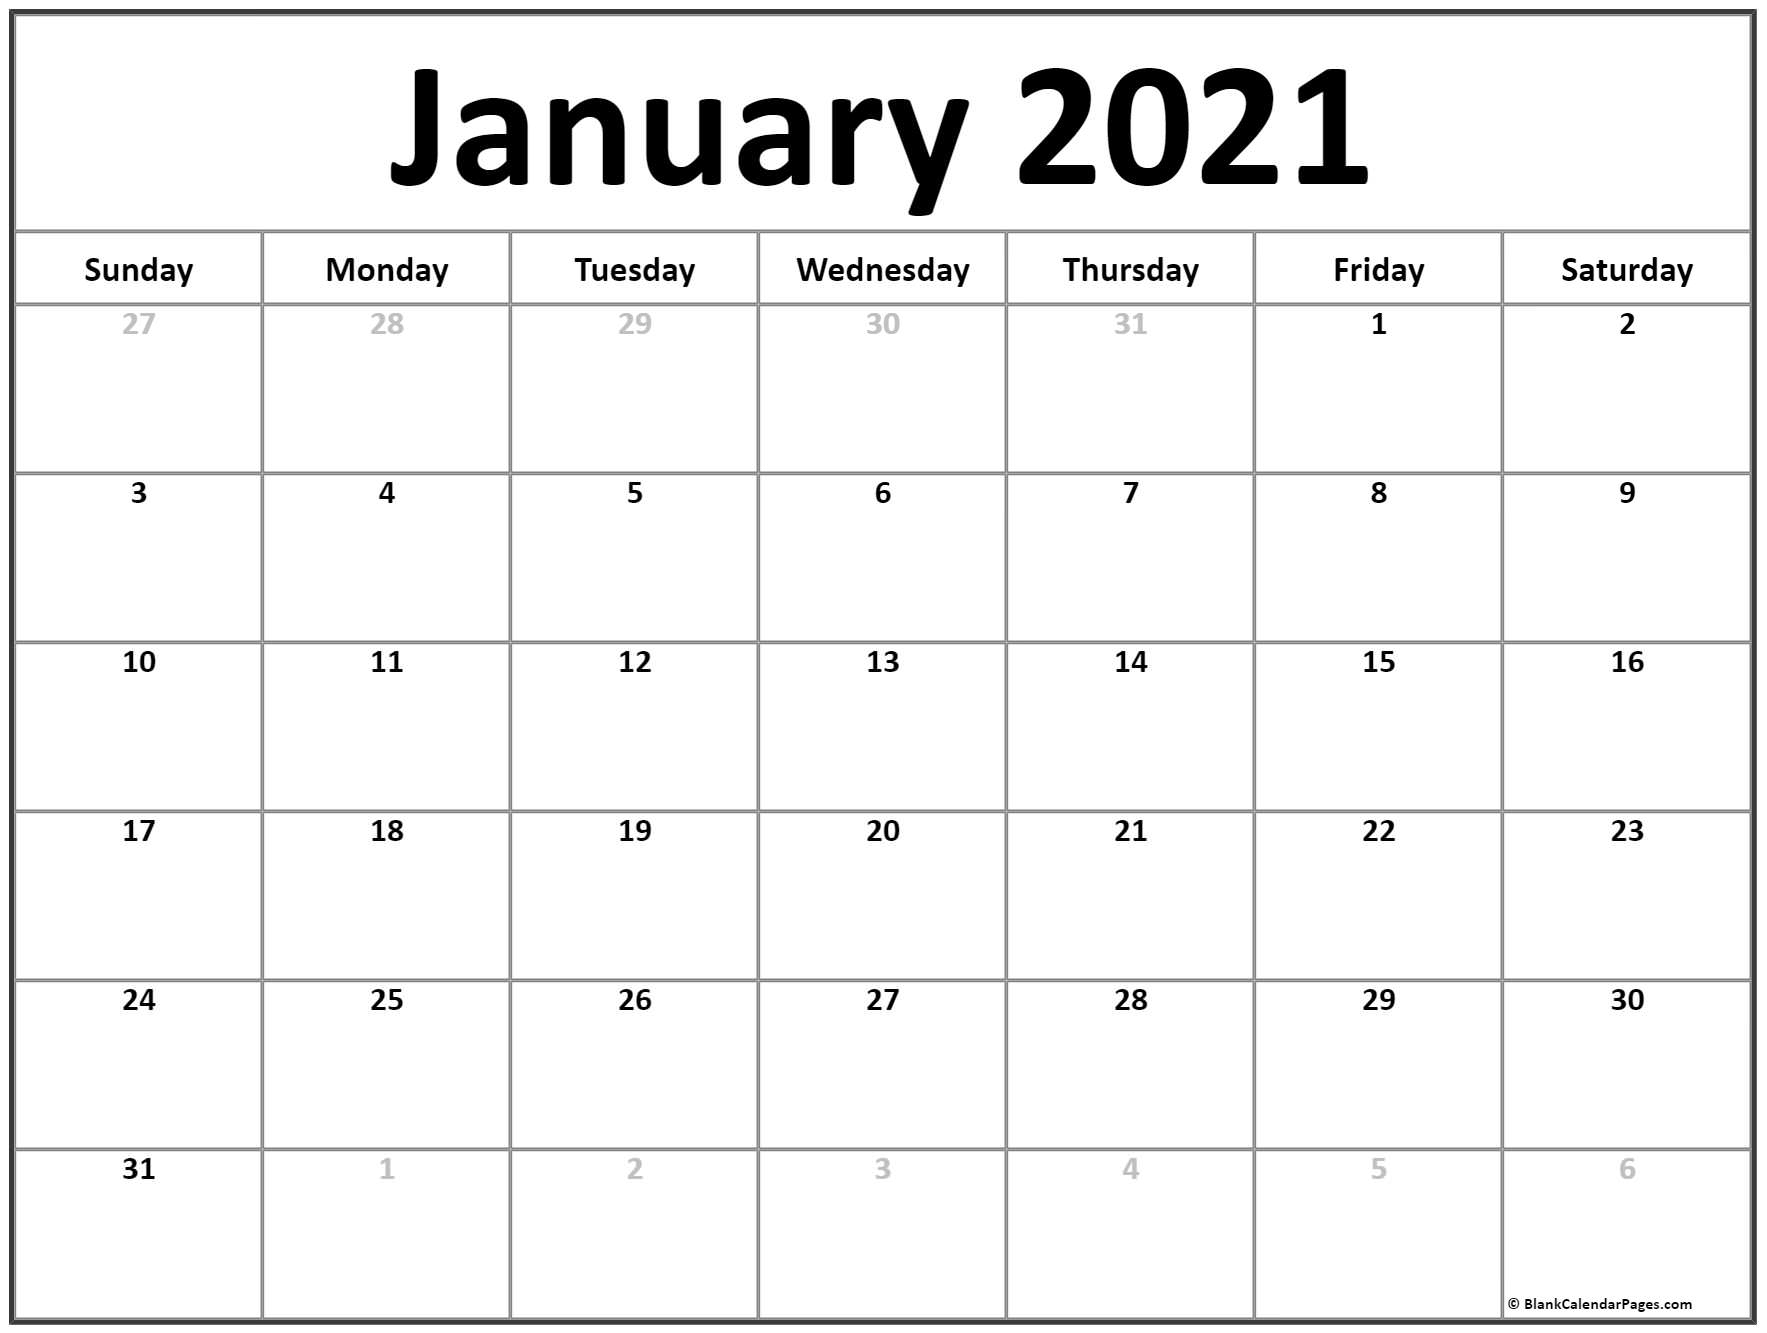 January 2021 Calendar 56 Templates Of 2021 Printable 1